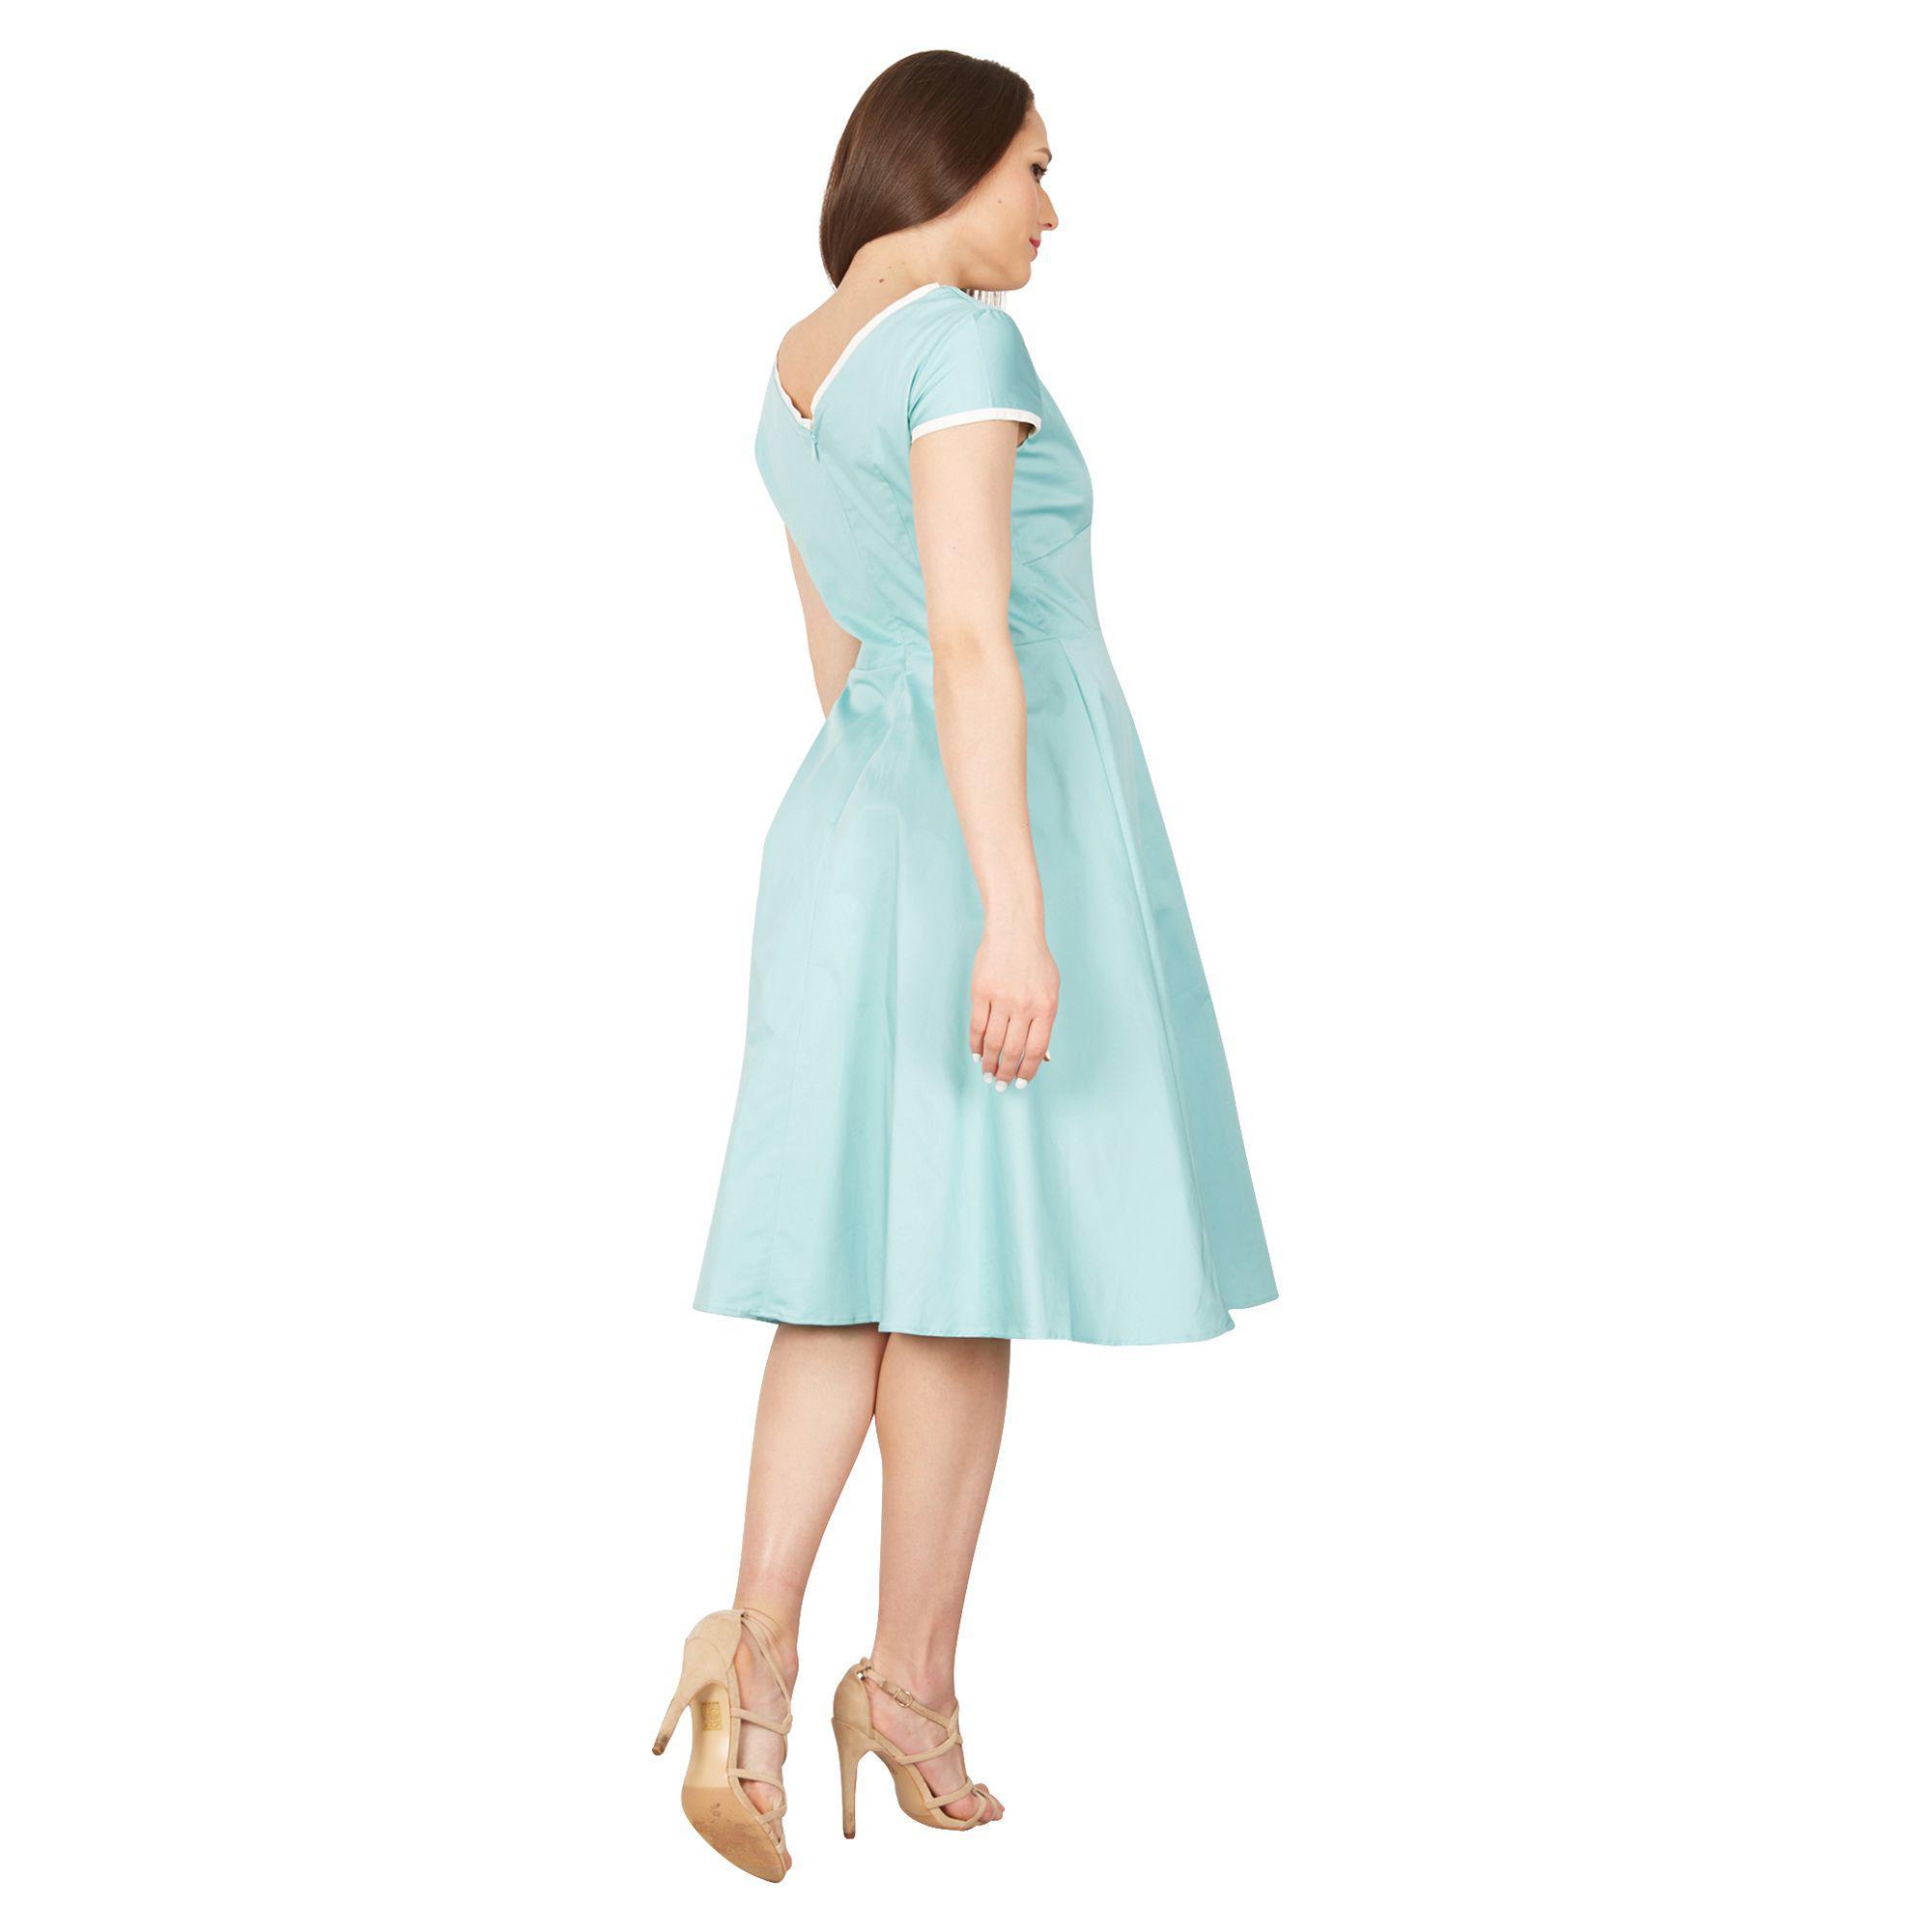 1078311942f1a Jolie Moi - Light Green Trimmed V Neck Cap Sleeve Swing Dress - Lyst. View  fullscreen